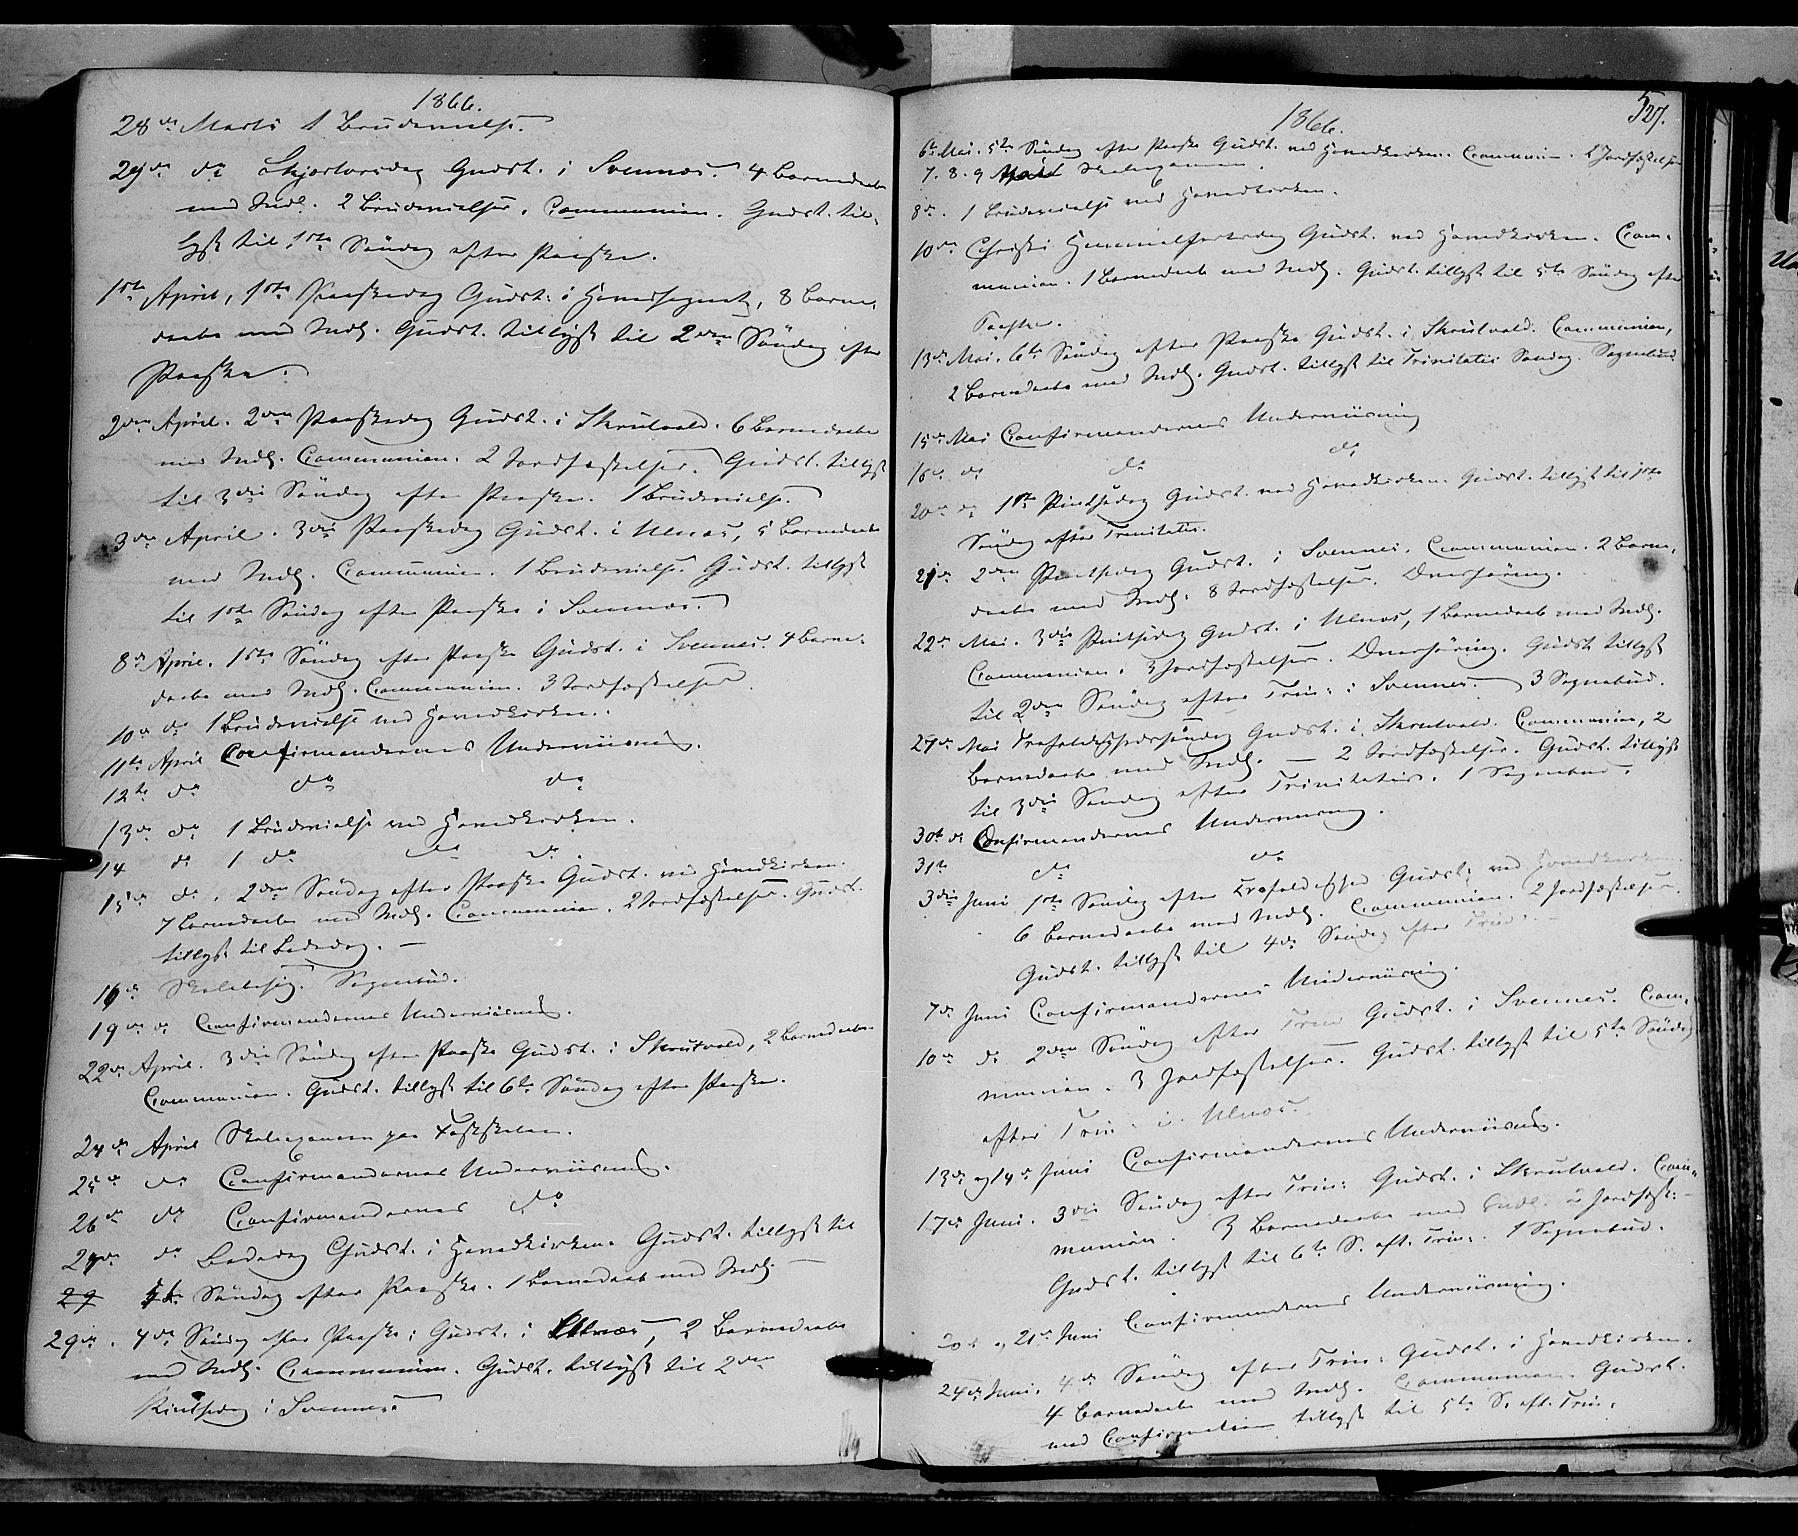 SAH, Nord-Aurdal prestekontor, Ministerialbok nr. 8, 1863-1875, s. 527